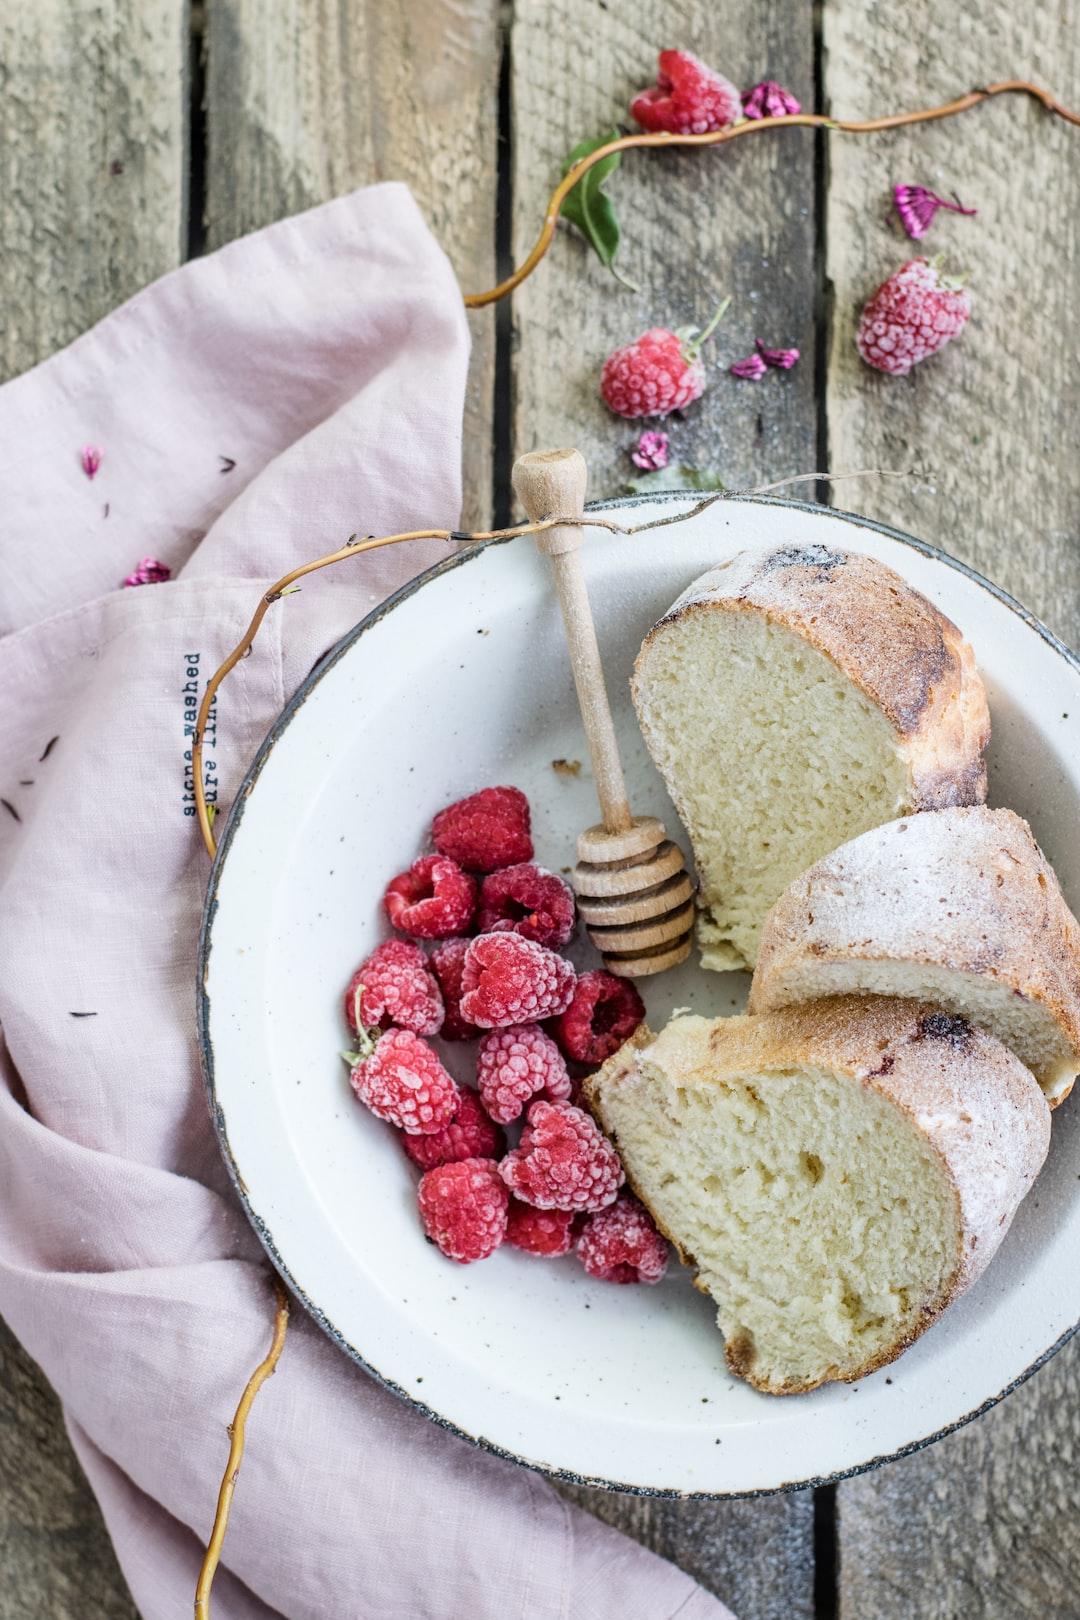 Traditional polish yeast cake